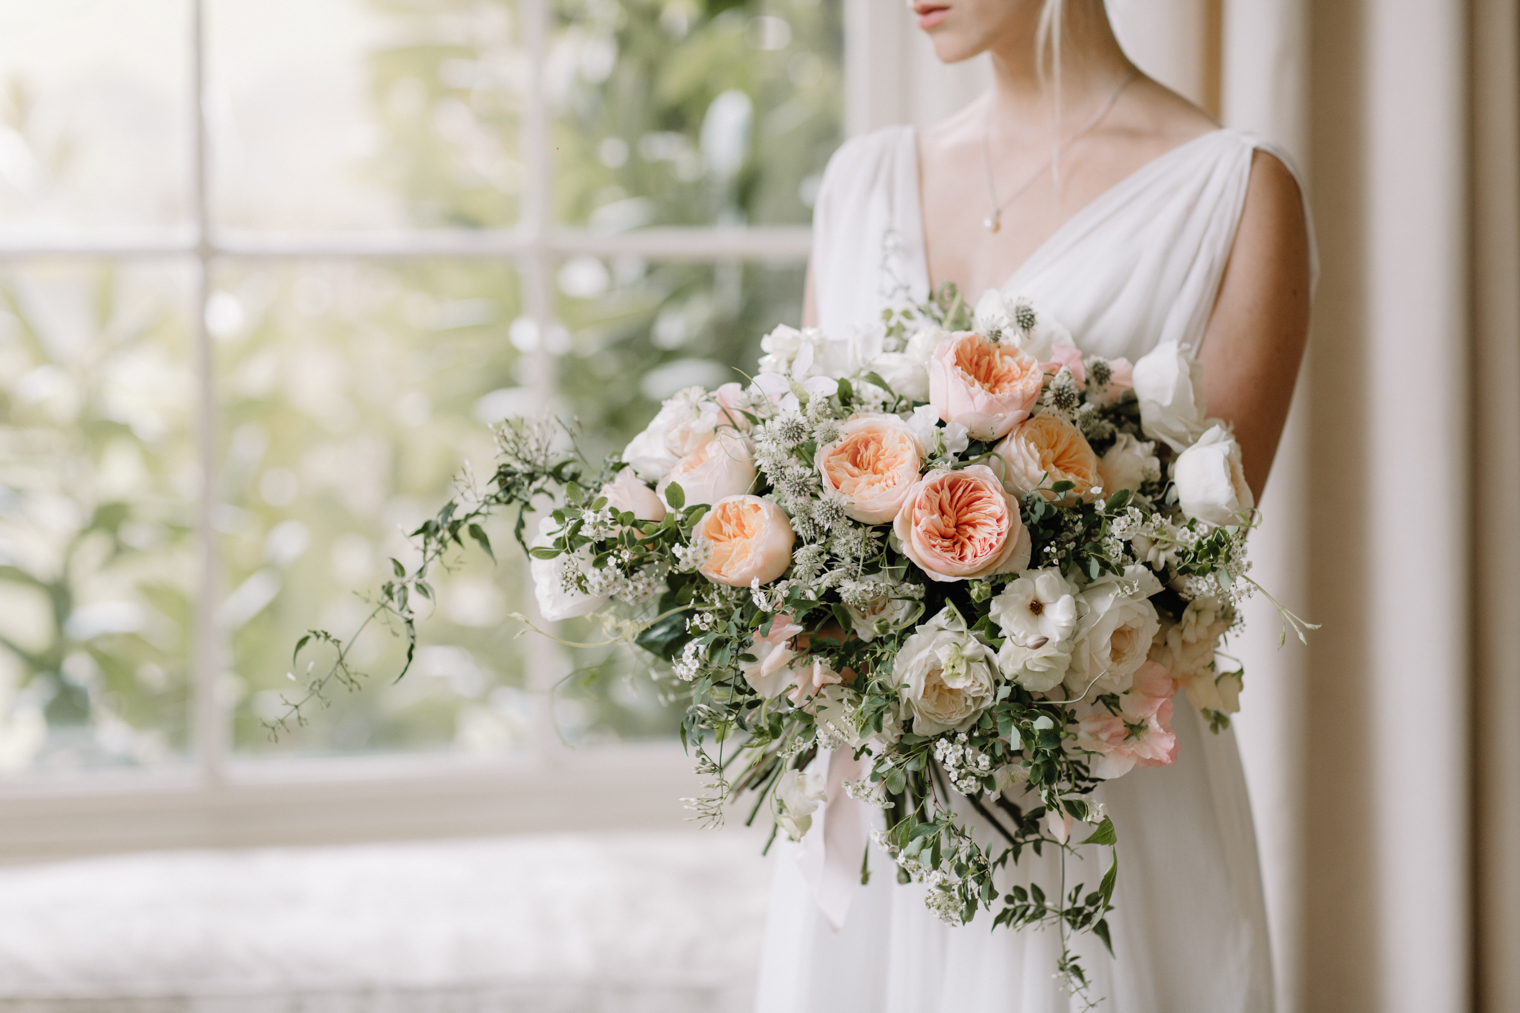 Juliet (Ausjameson) & Purity (Ausoblige) David Austin Wedding Roses